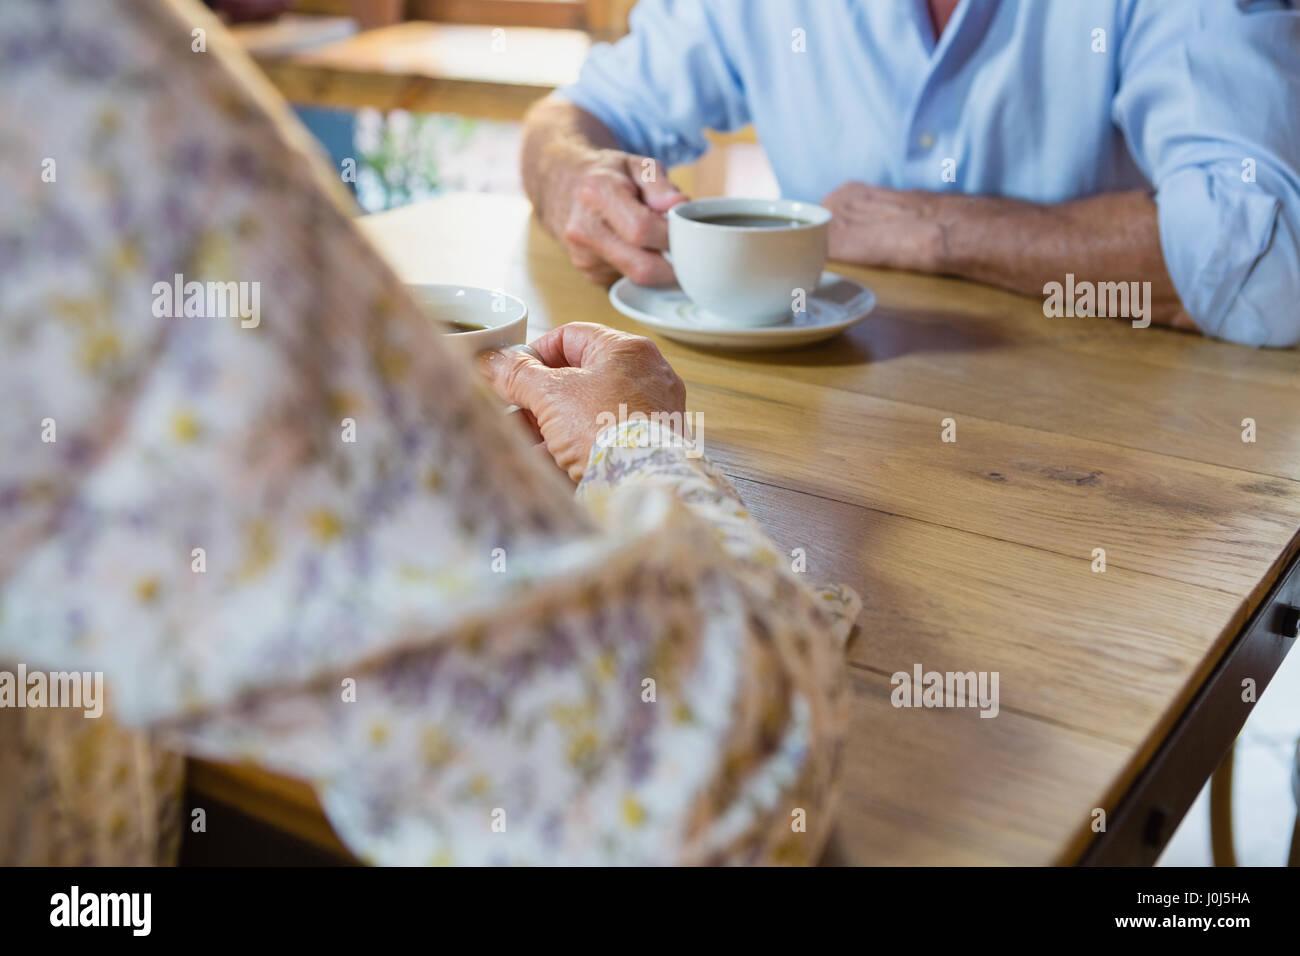 Mittelteil des älteres Paar mit Kaffee in CafÃ?© Stockbild